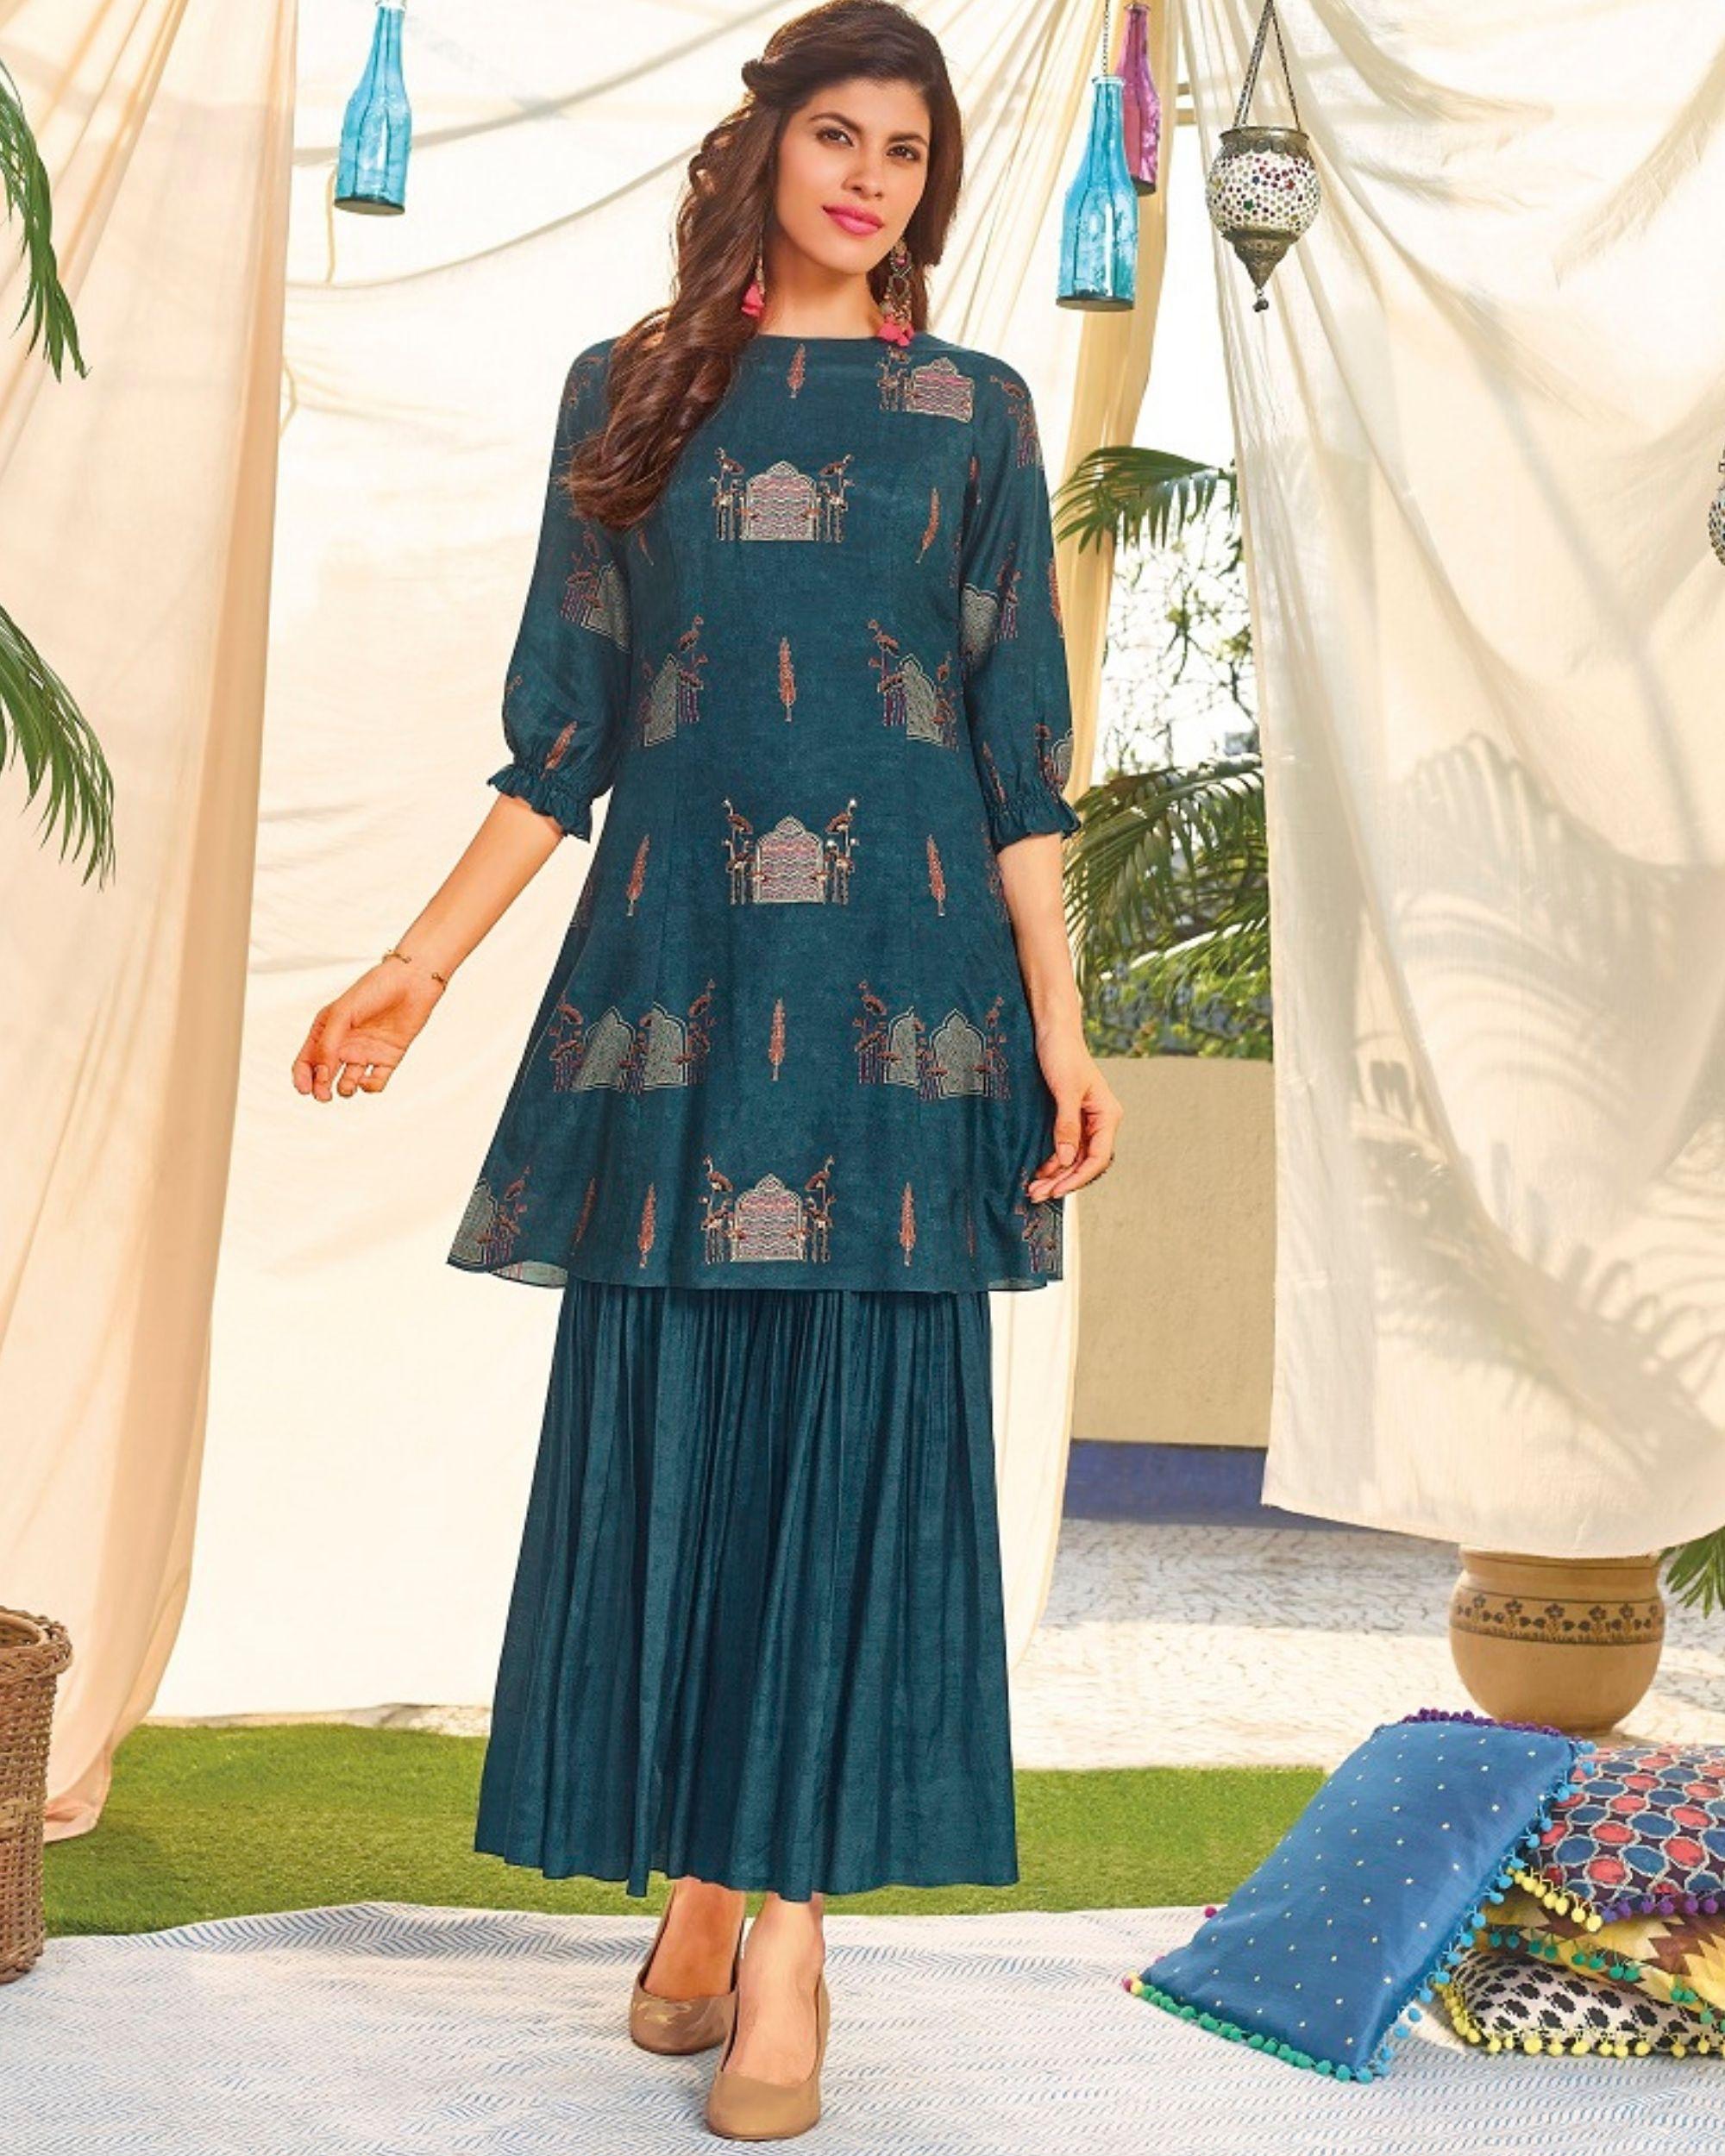 Blue digital printed kurta and hand embroidered sharara - set of two